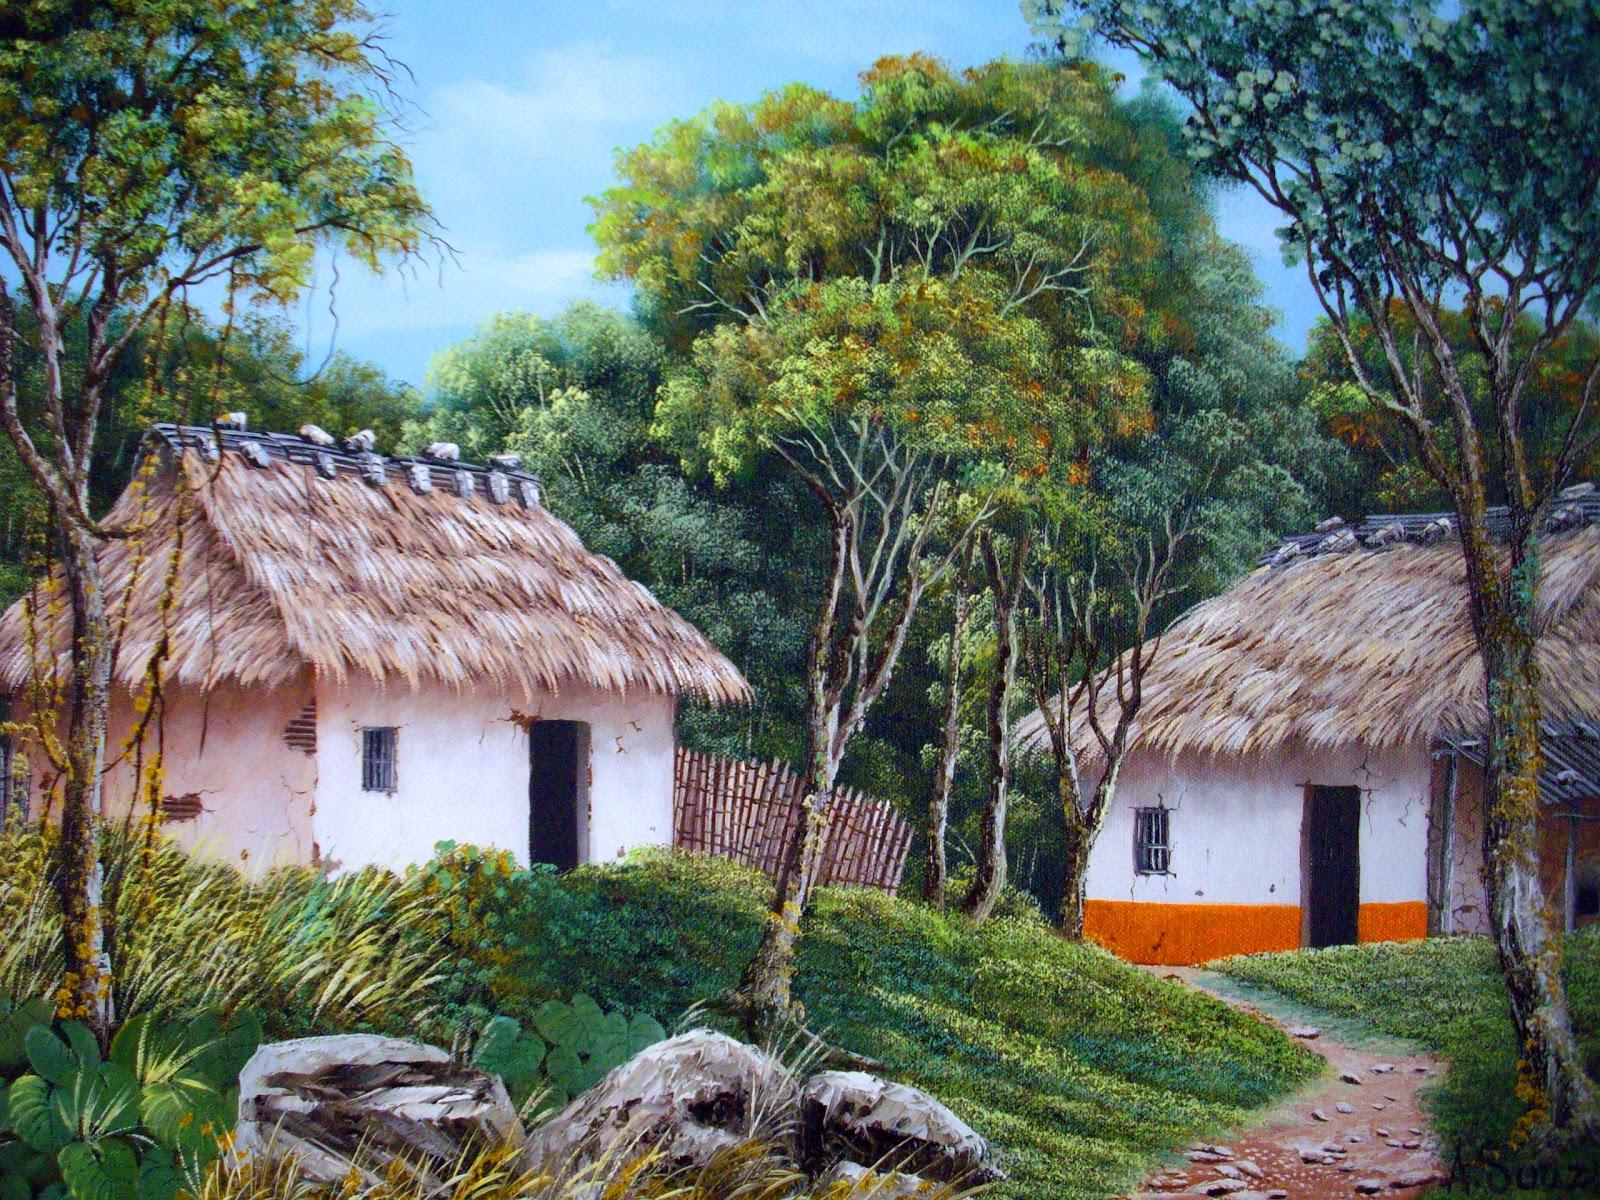 Im genes arte pinturas lindos paisajes con casas - Paisajes de casas ...